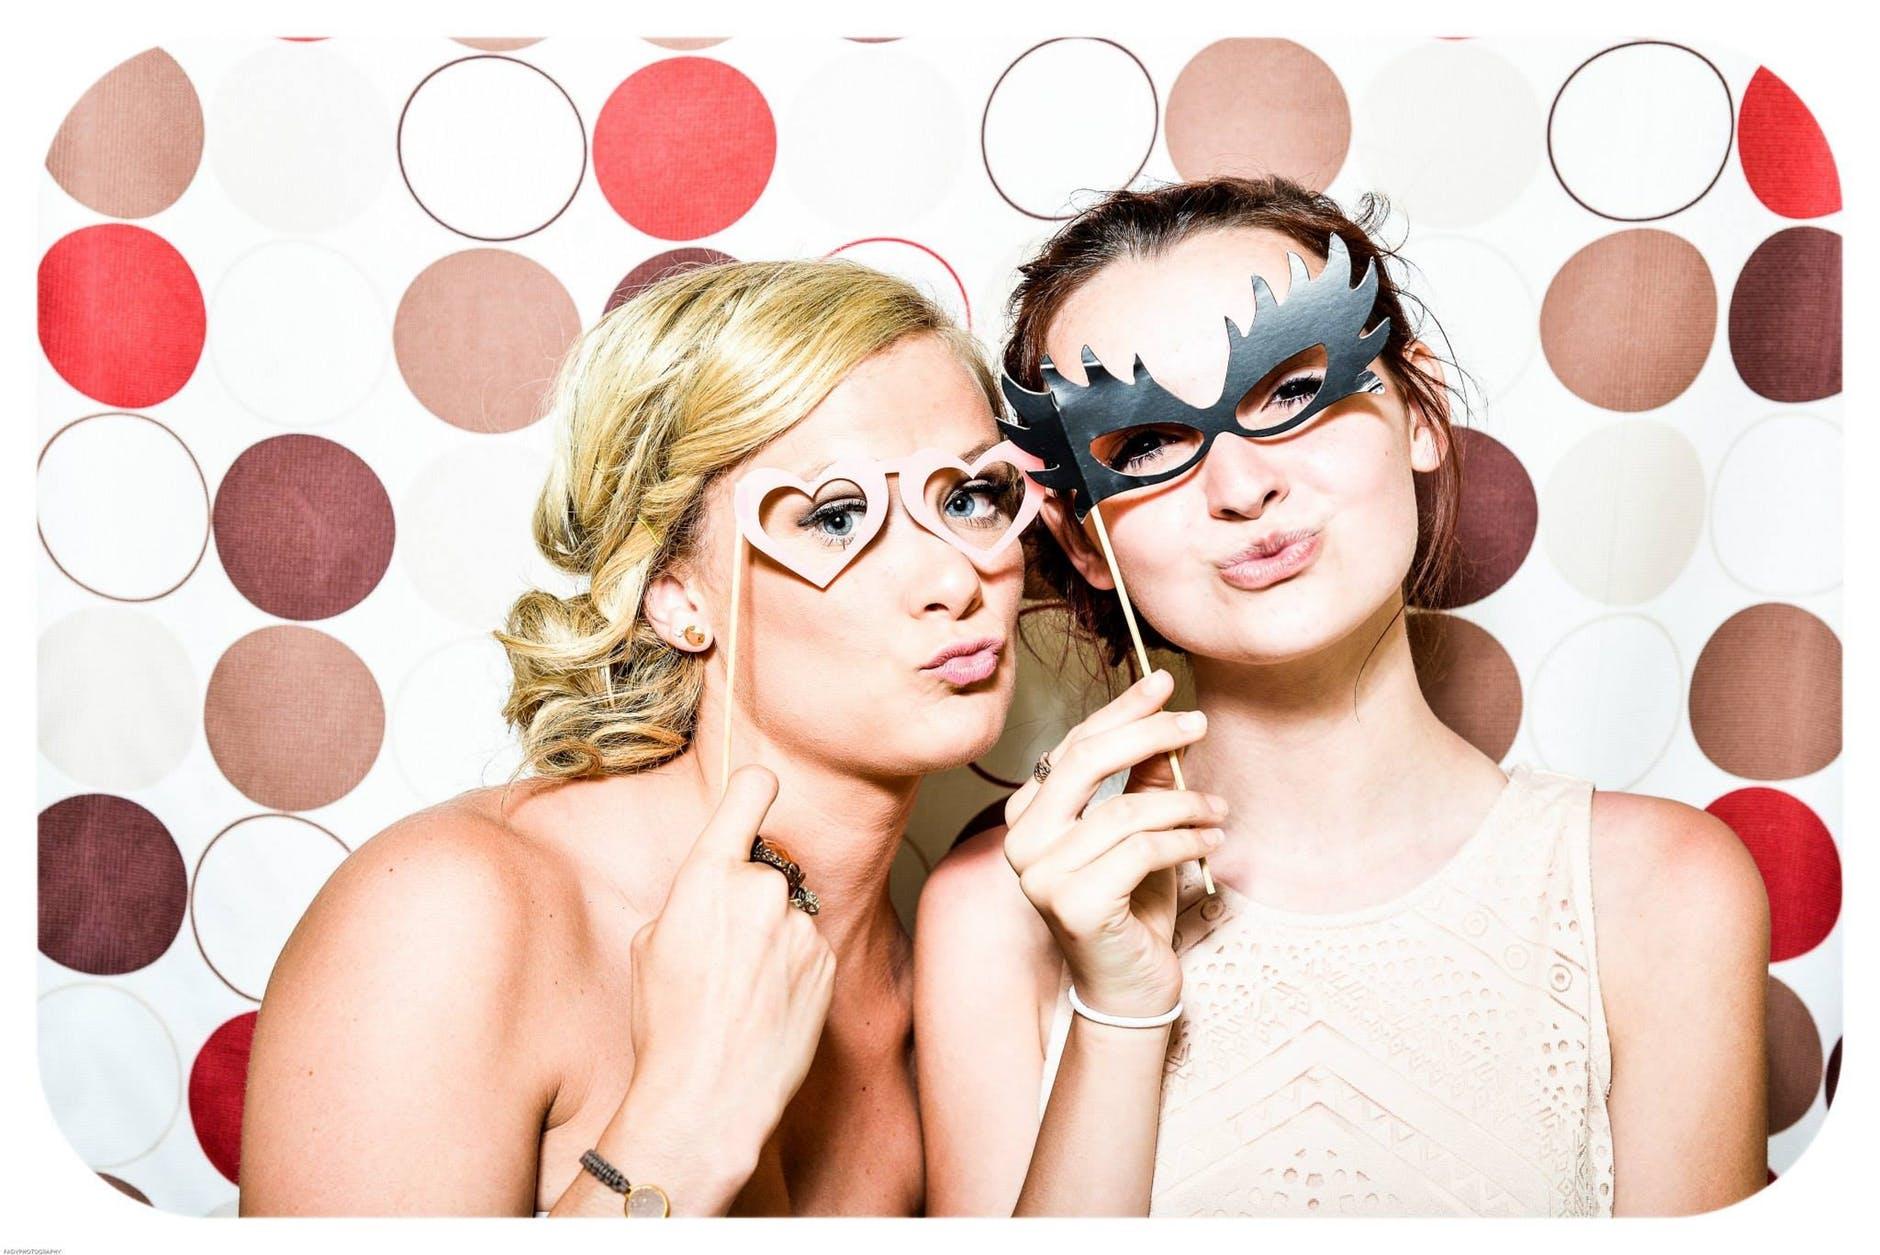 photo-booth-wedding-party-girls-160420.jpeg